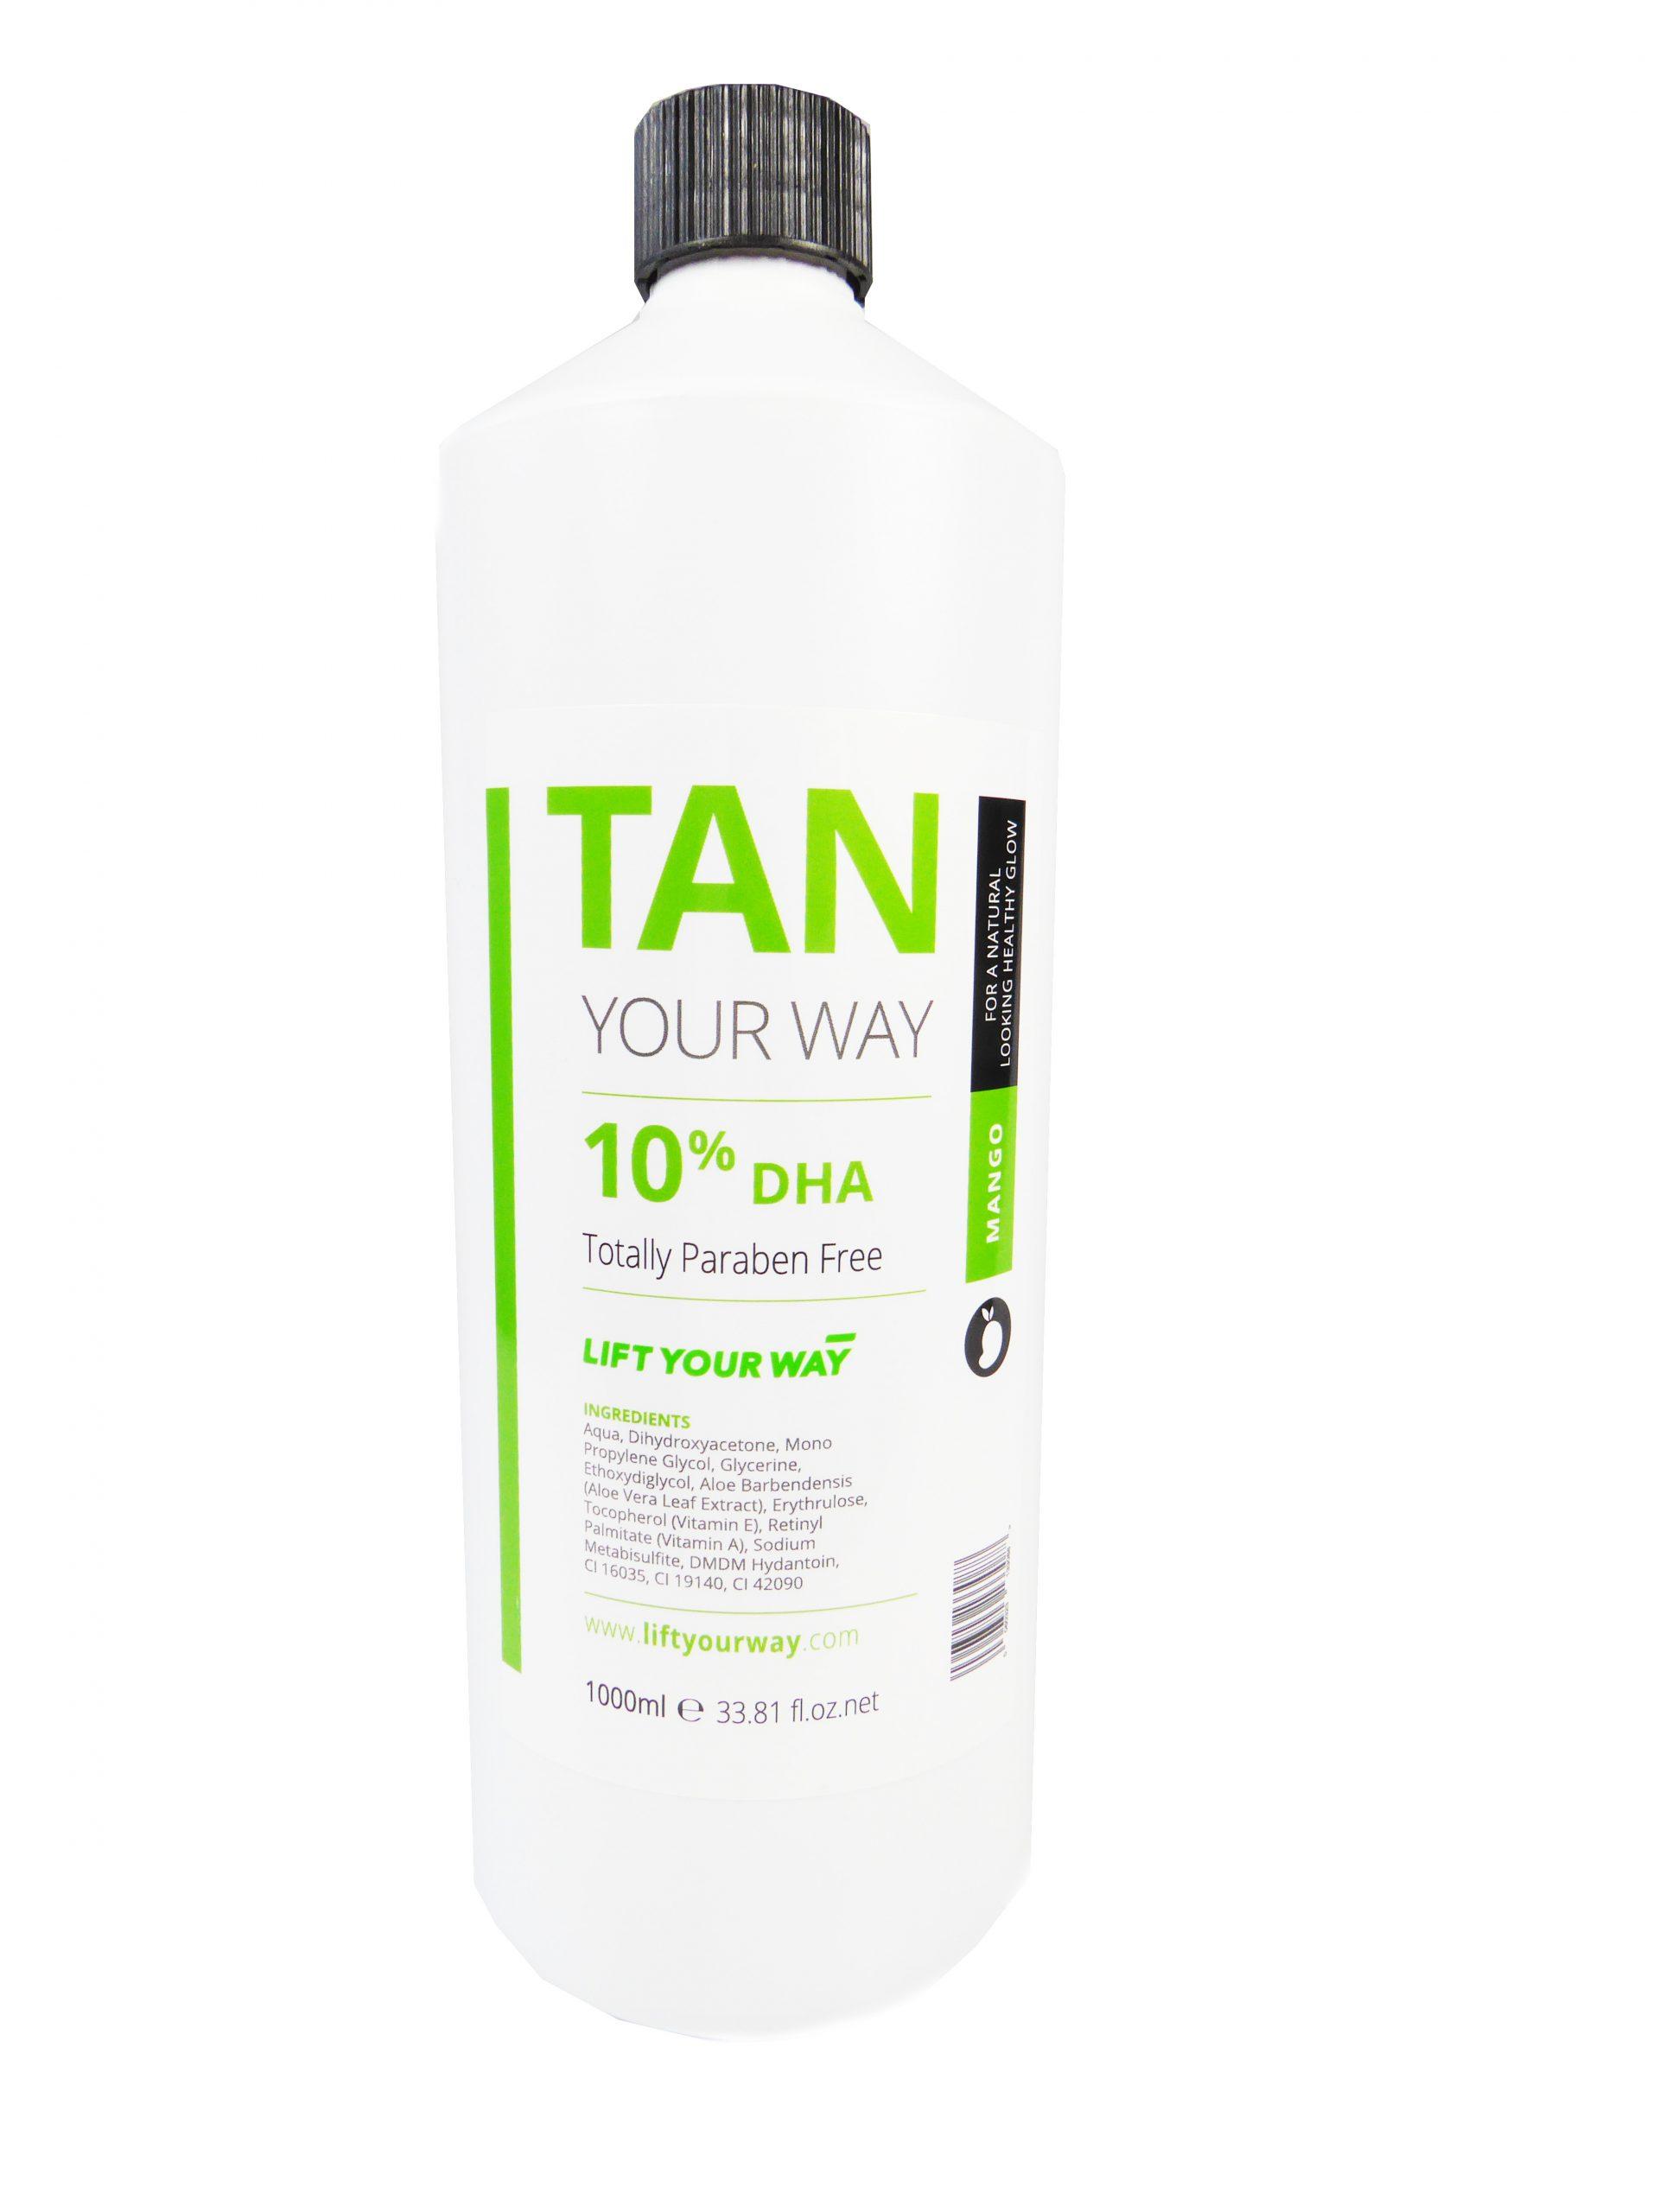 Photoshoot spray tan